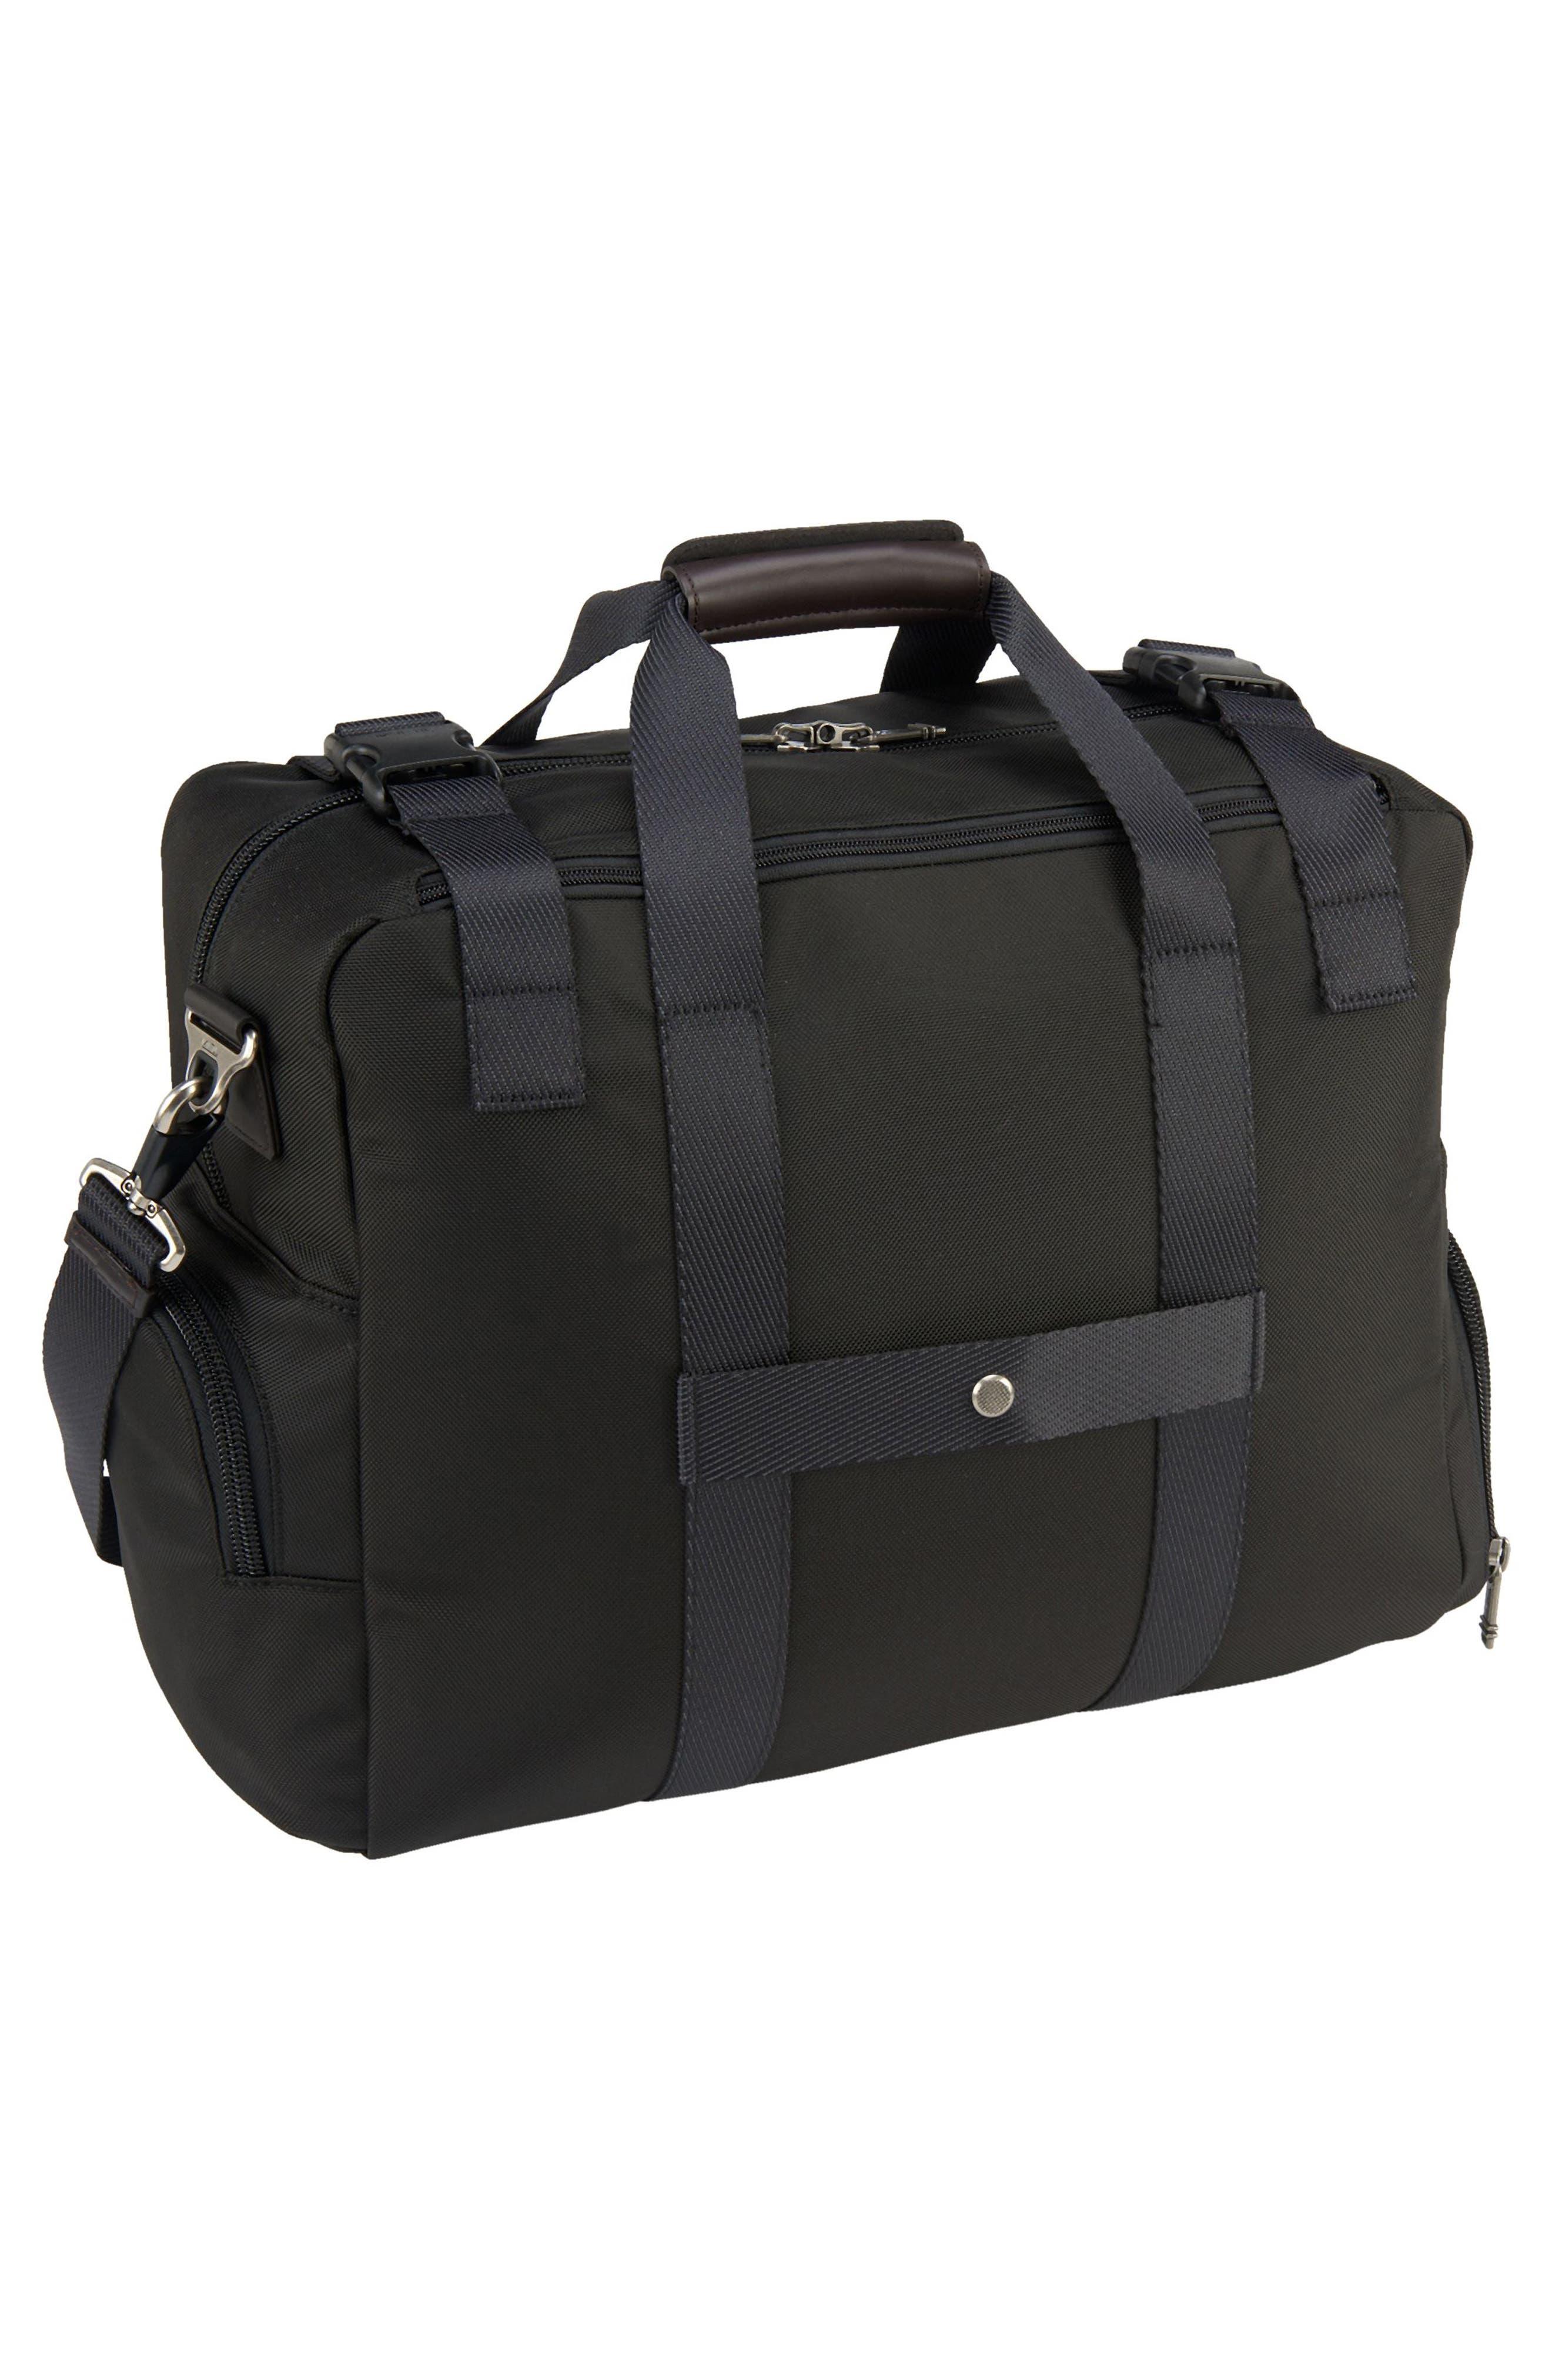 Alpha Bravo Buckner Duffel Bag,                             Alternate thumbnail 6, color,                             Hickory